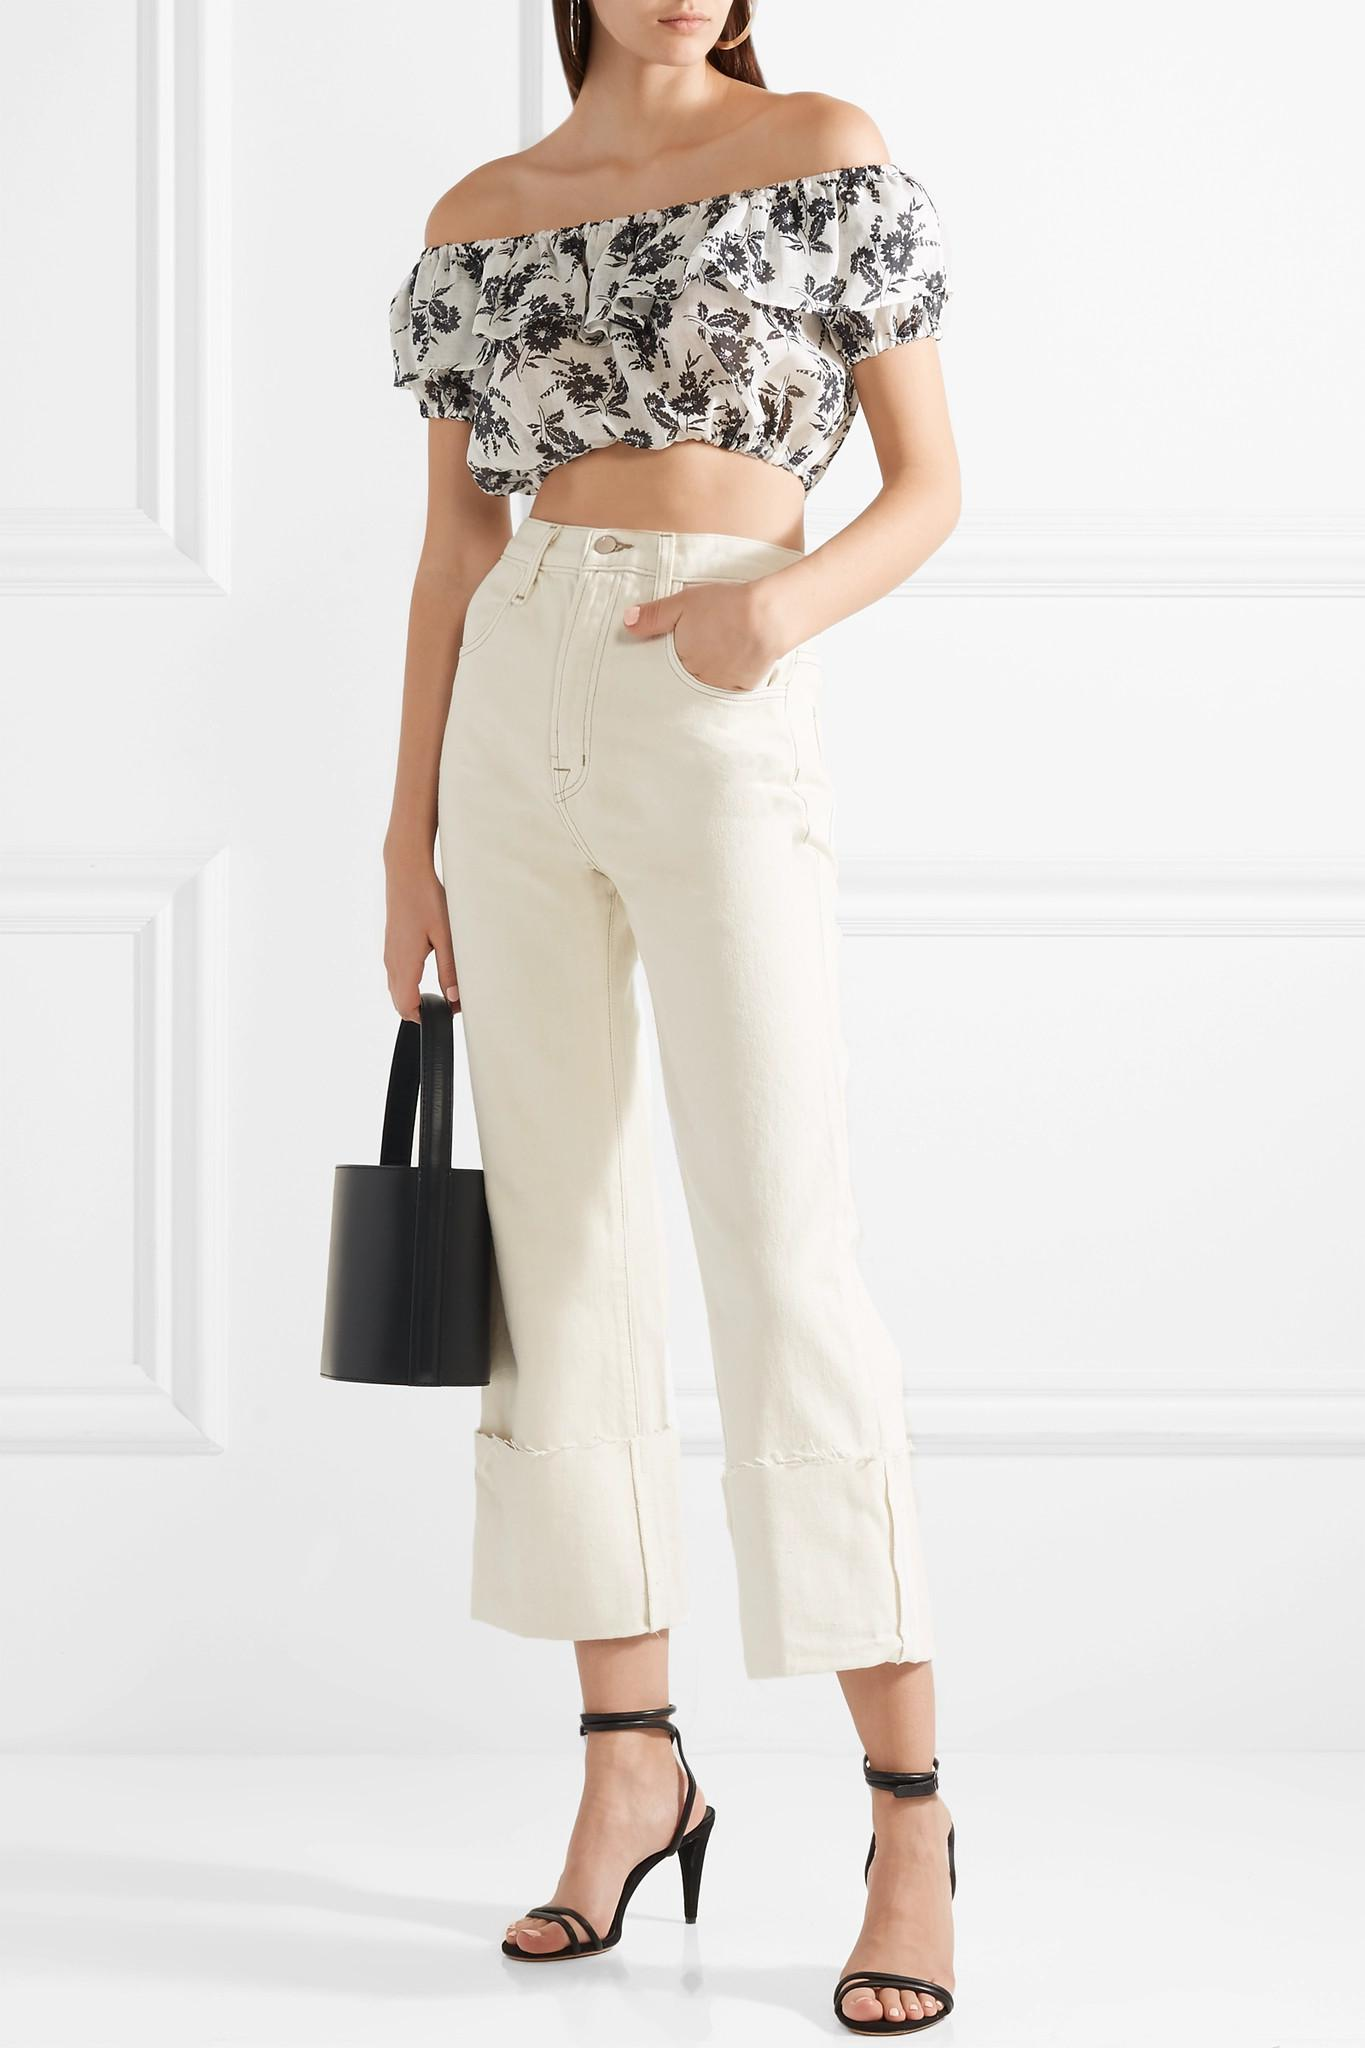 2c9621977f5 miu-miu-white-Cropped-Off-the-shoulder-Floral-print-Ramie-Top.jpeg